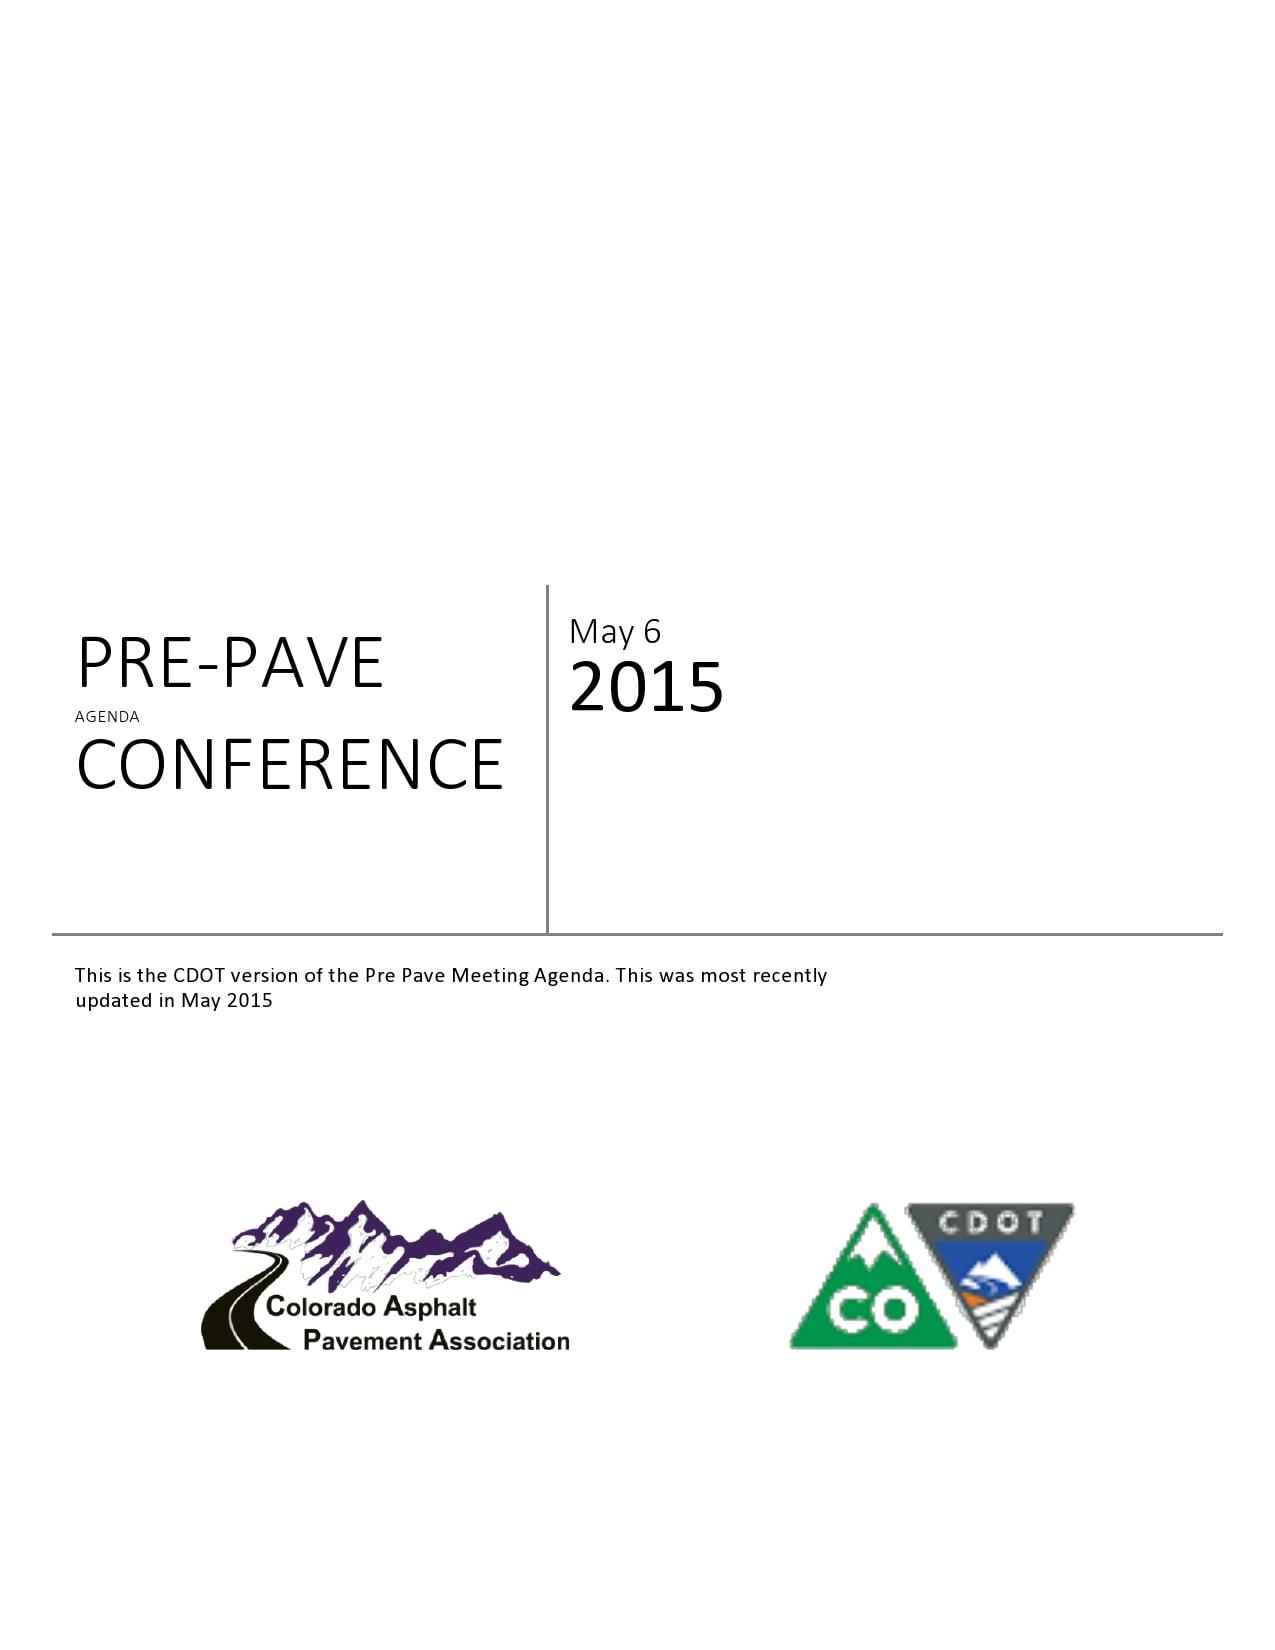 conference agenda template 27